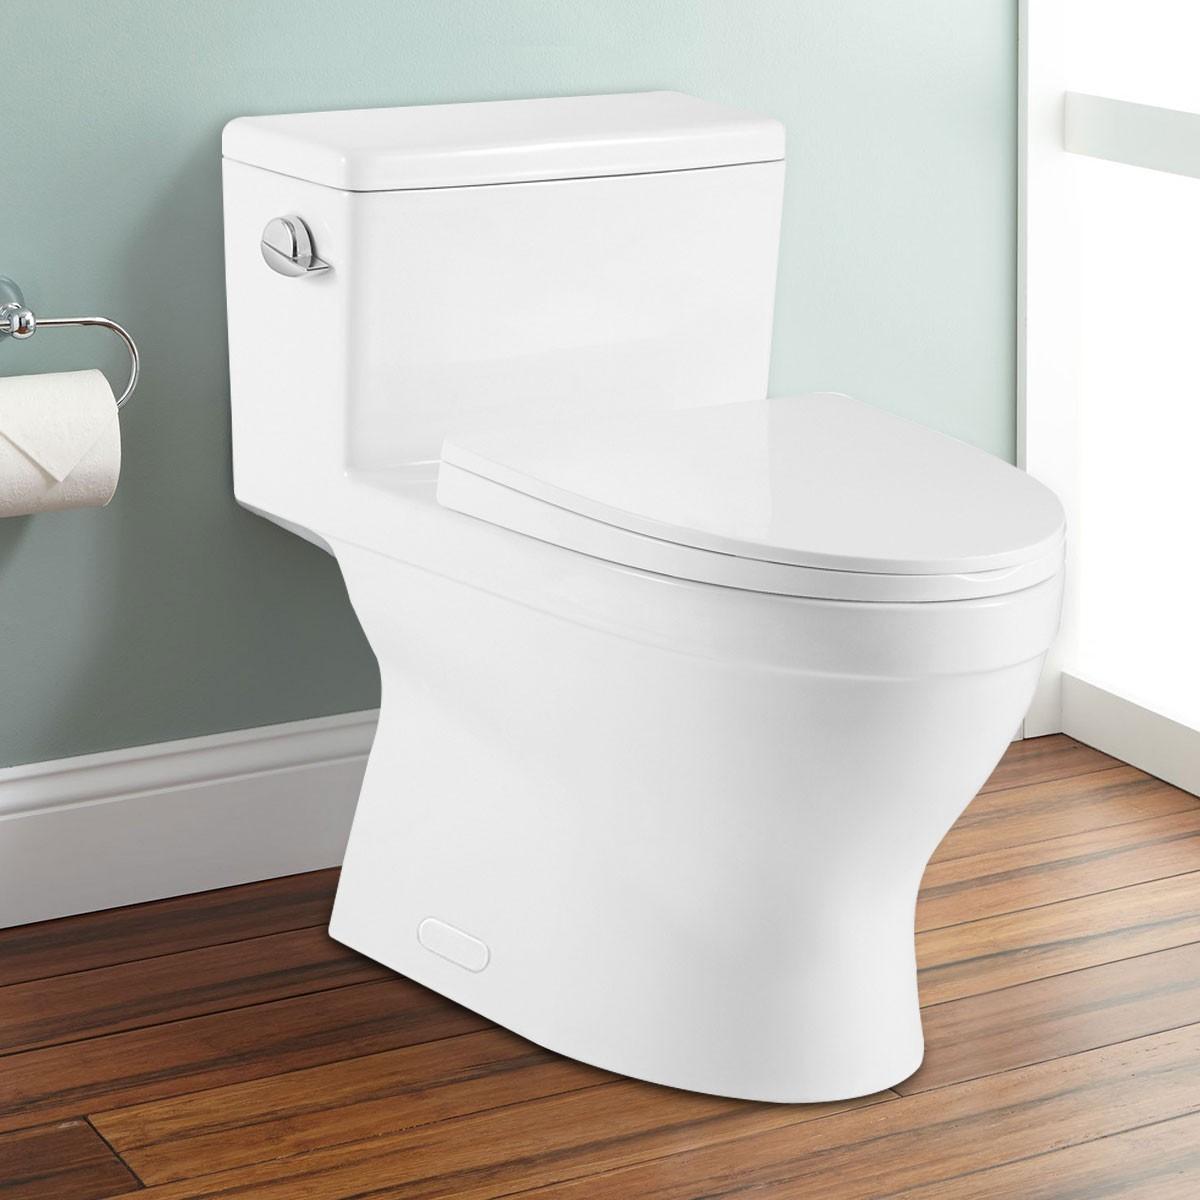 CUPC Single Flush High Efficiency Water Saving One-piece Toilet (DK-ZBQ-12234)